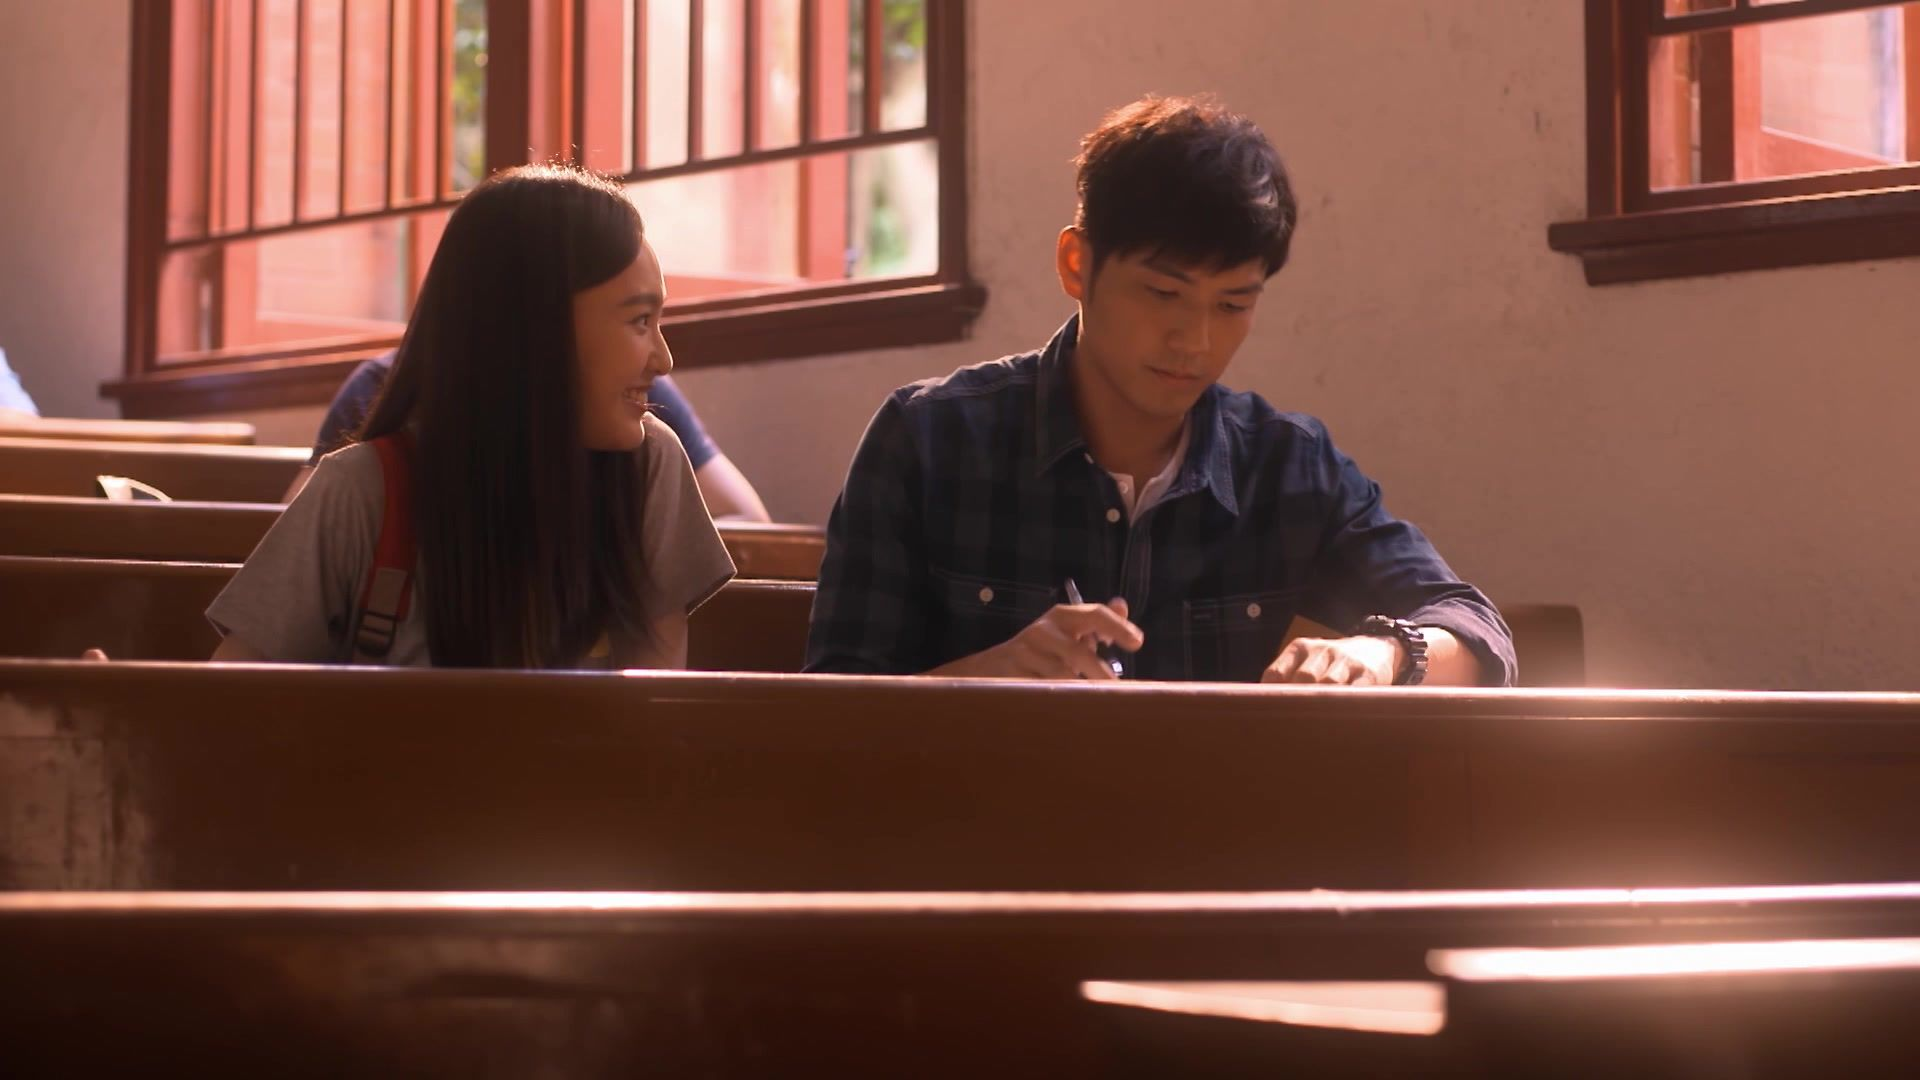 My Sunshine (Director's Cut) - 何以笙箫默 - Watch Full Episodes Free